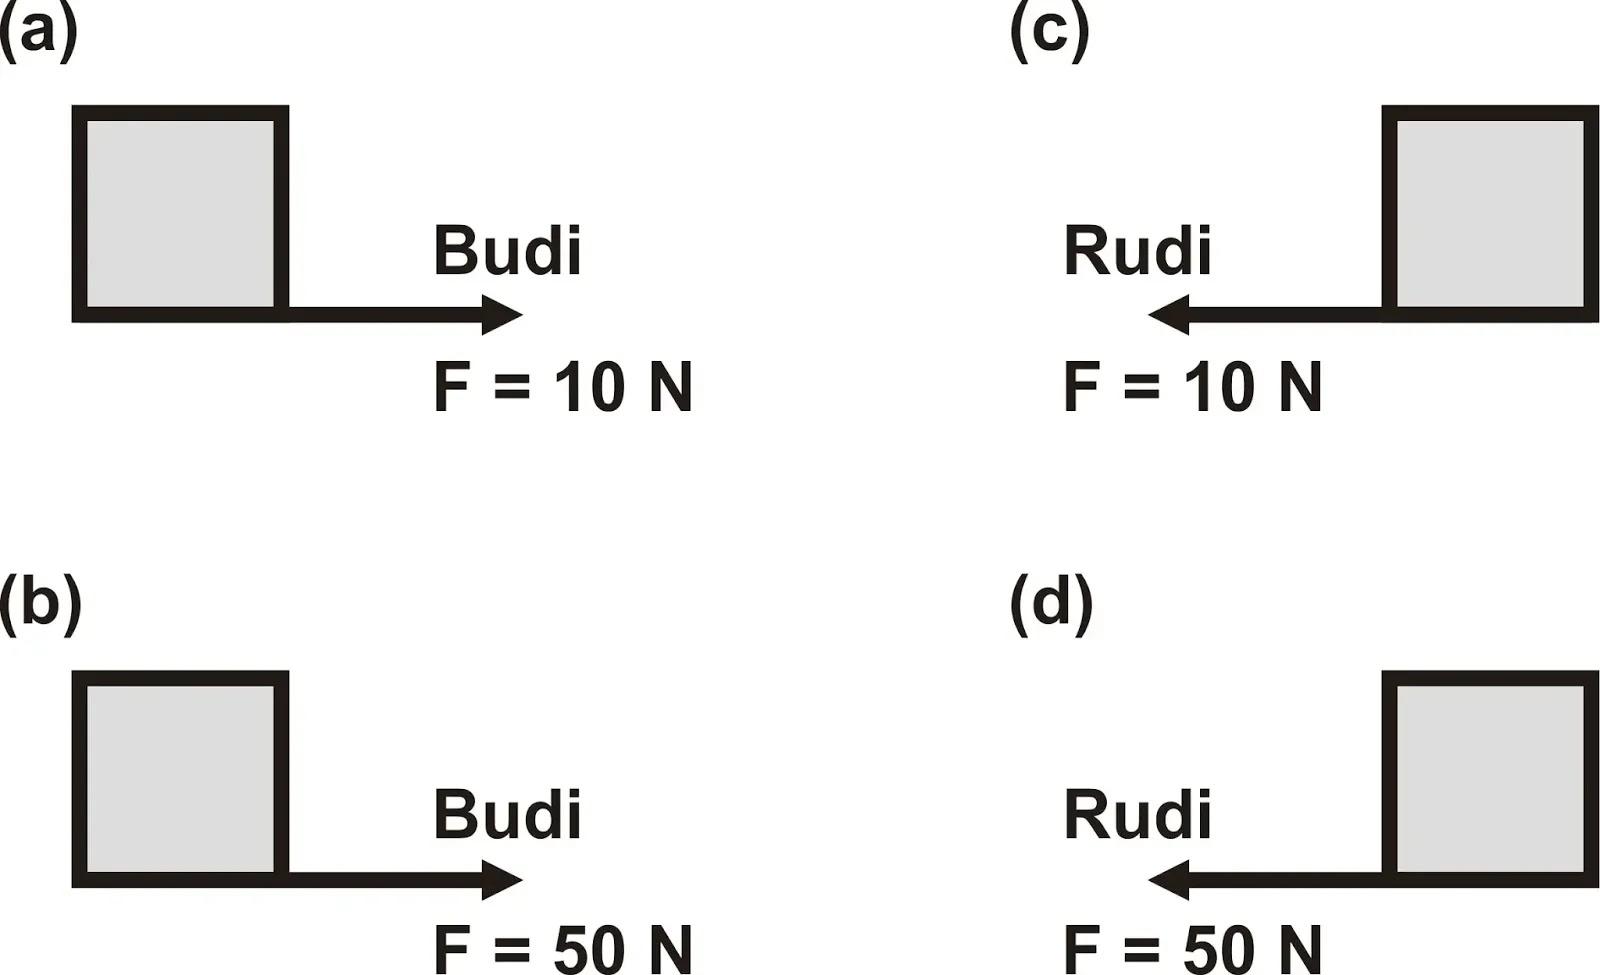 Kumpulan Soal Dan Pembahasan Lengkap Tentang Gaya Dan Hukum Newton Materi Fisika Kelas 8 Fisika